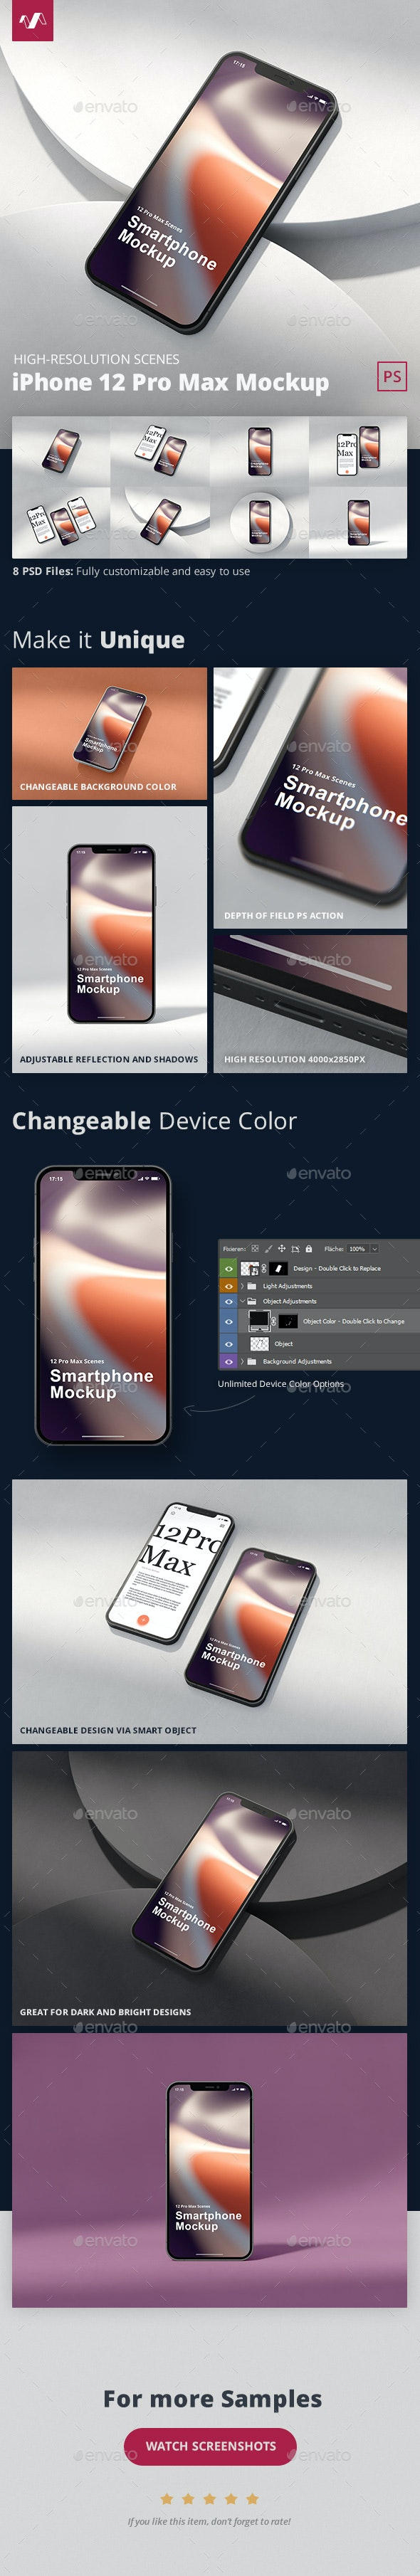 Phone 12 Pro Max Mockup Scenes - Mobile Displays